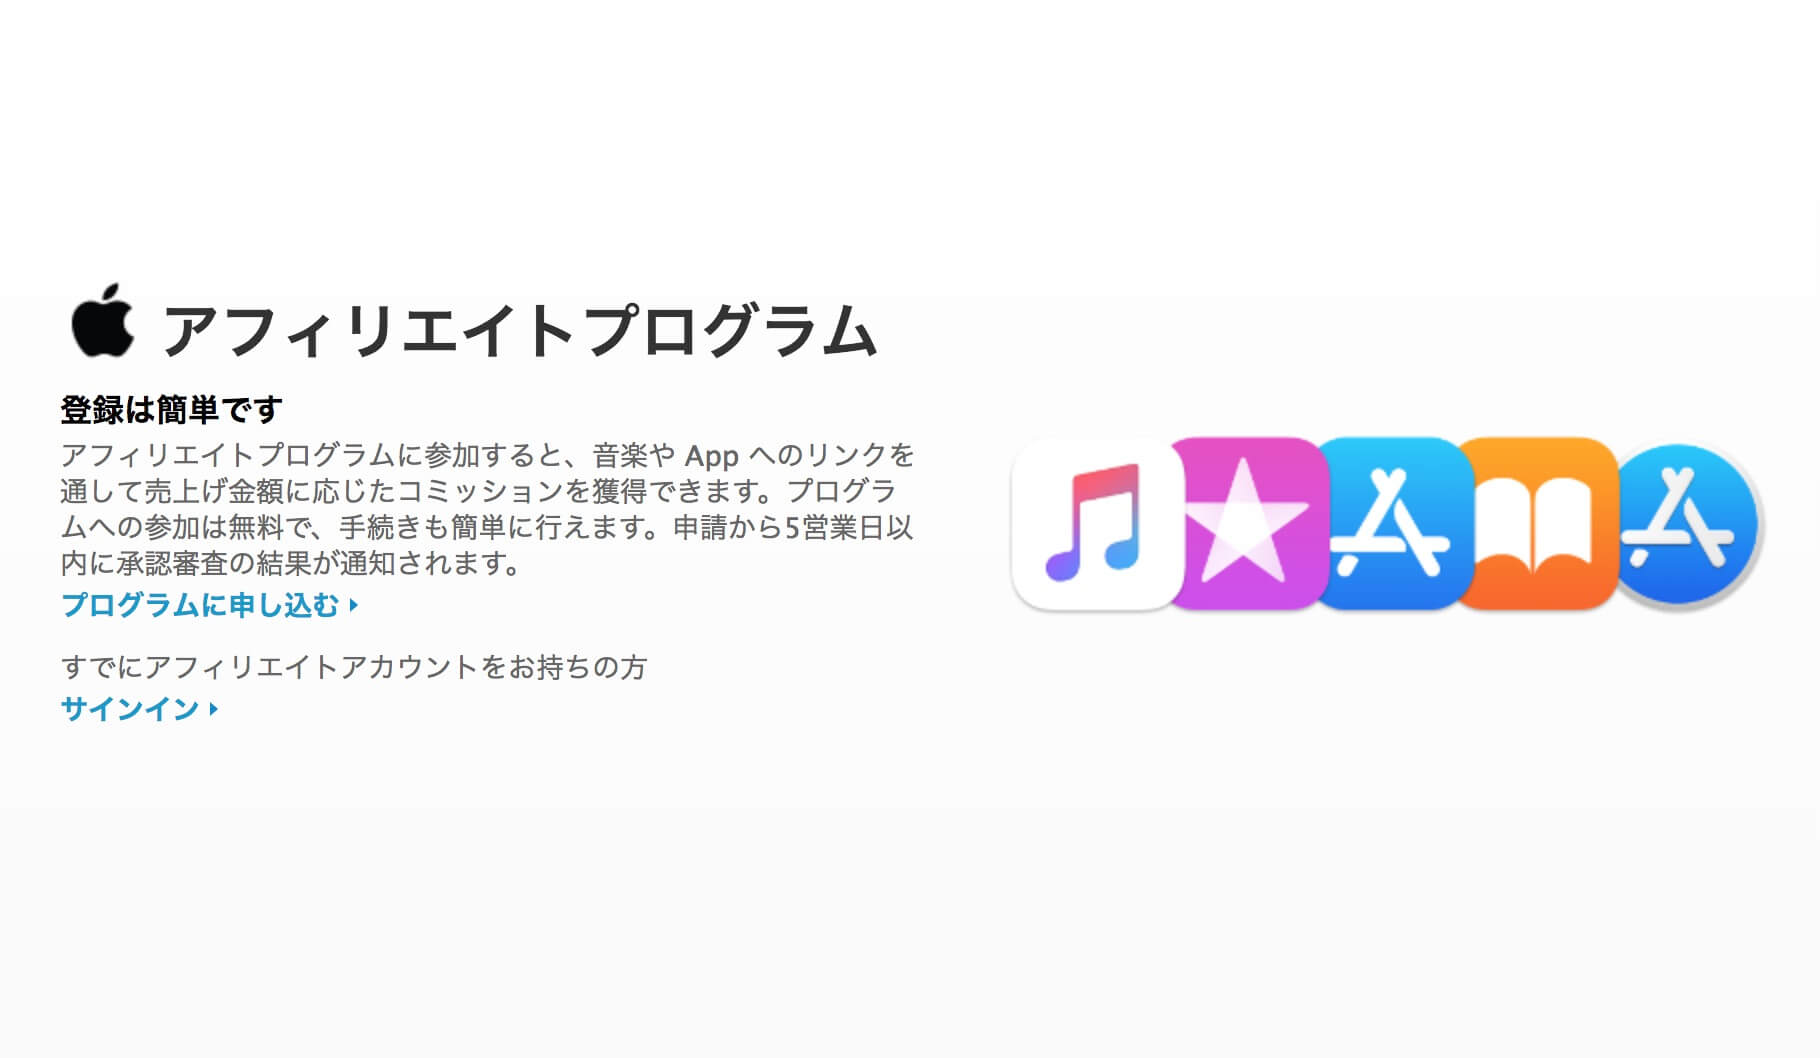 App Store アフィリエイト プログラム